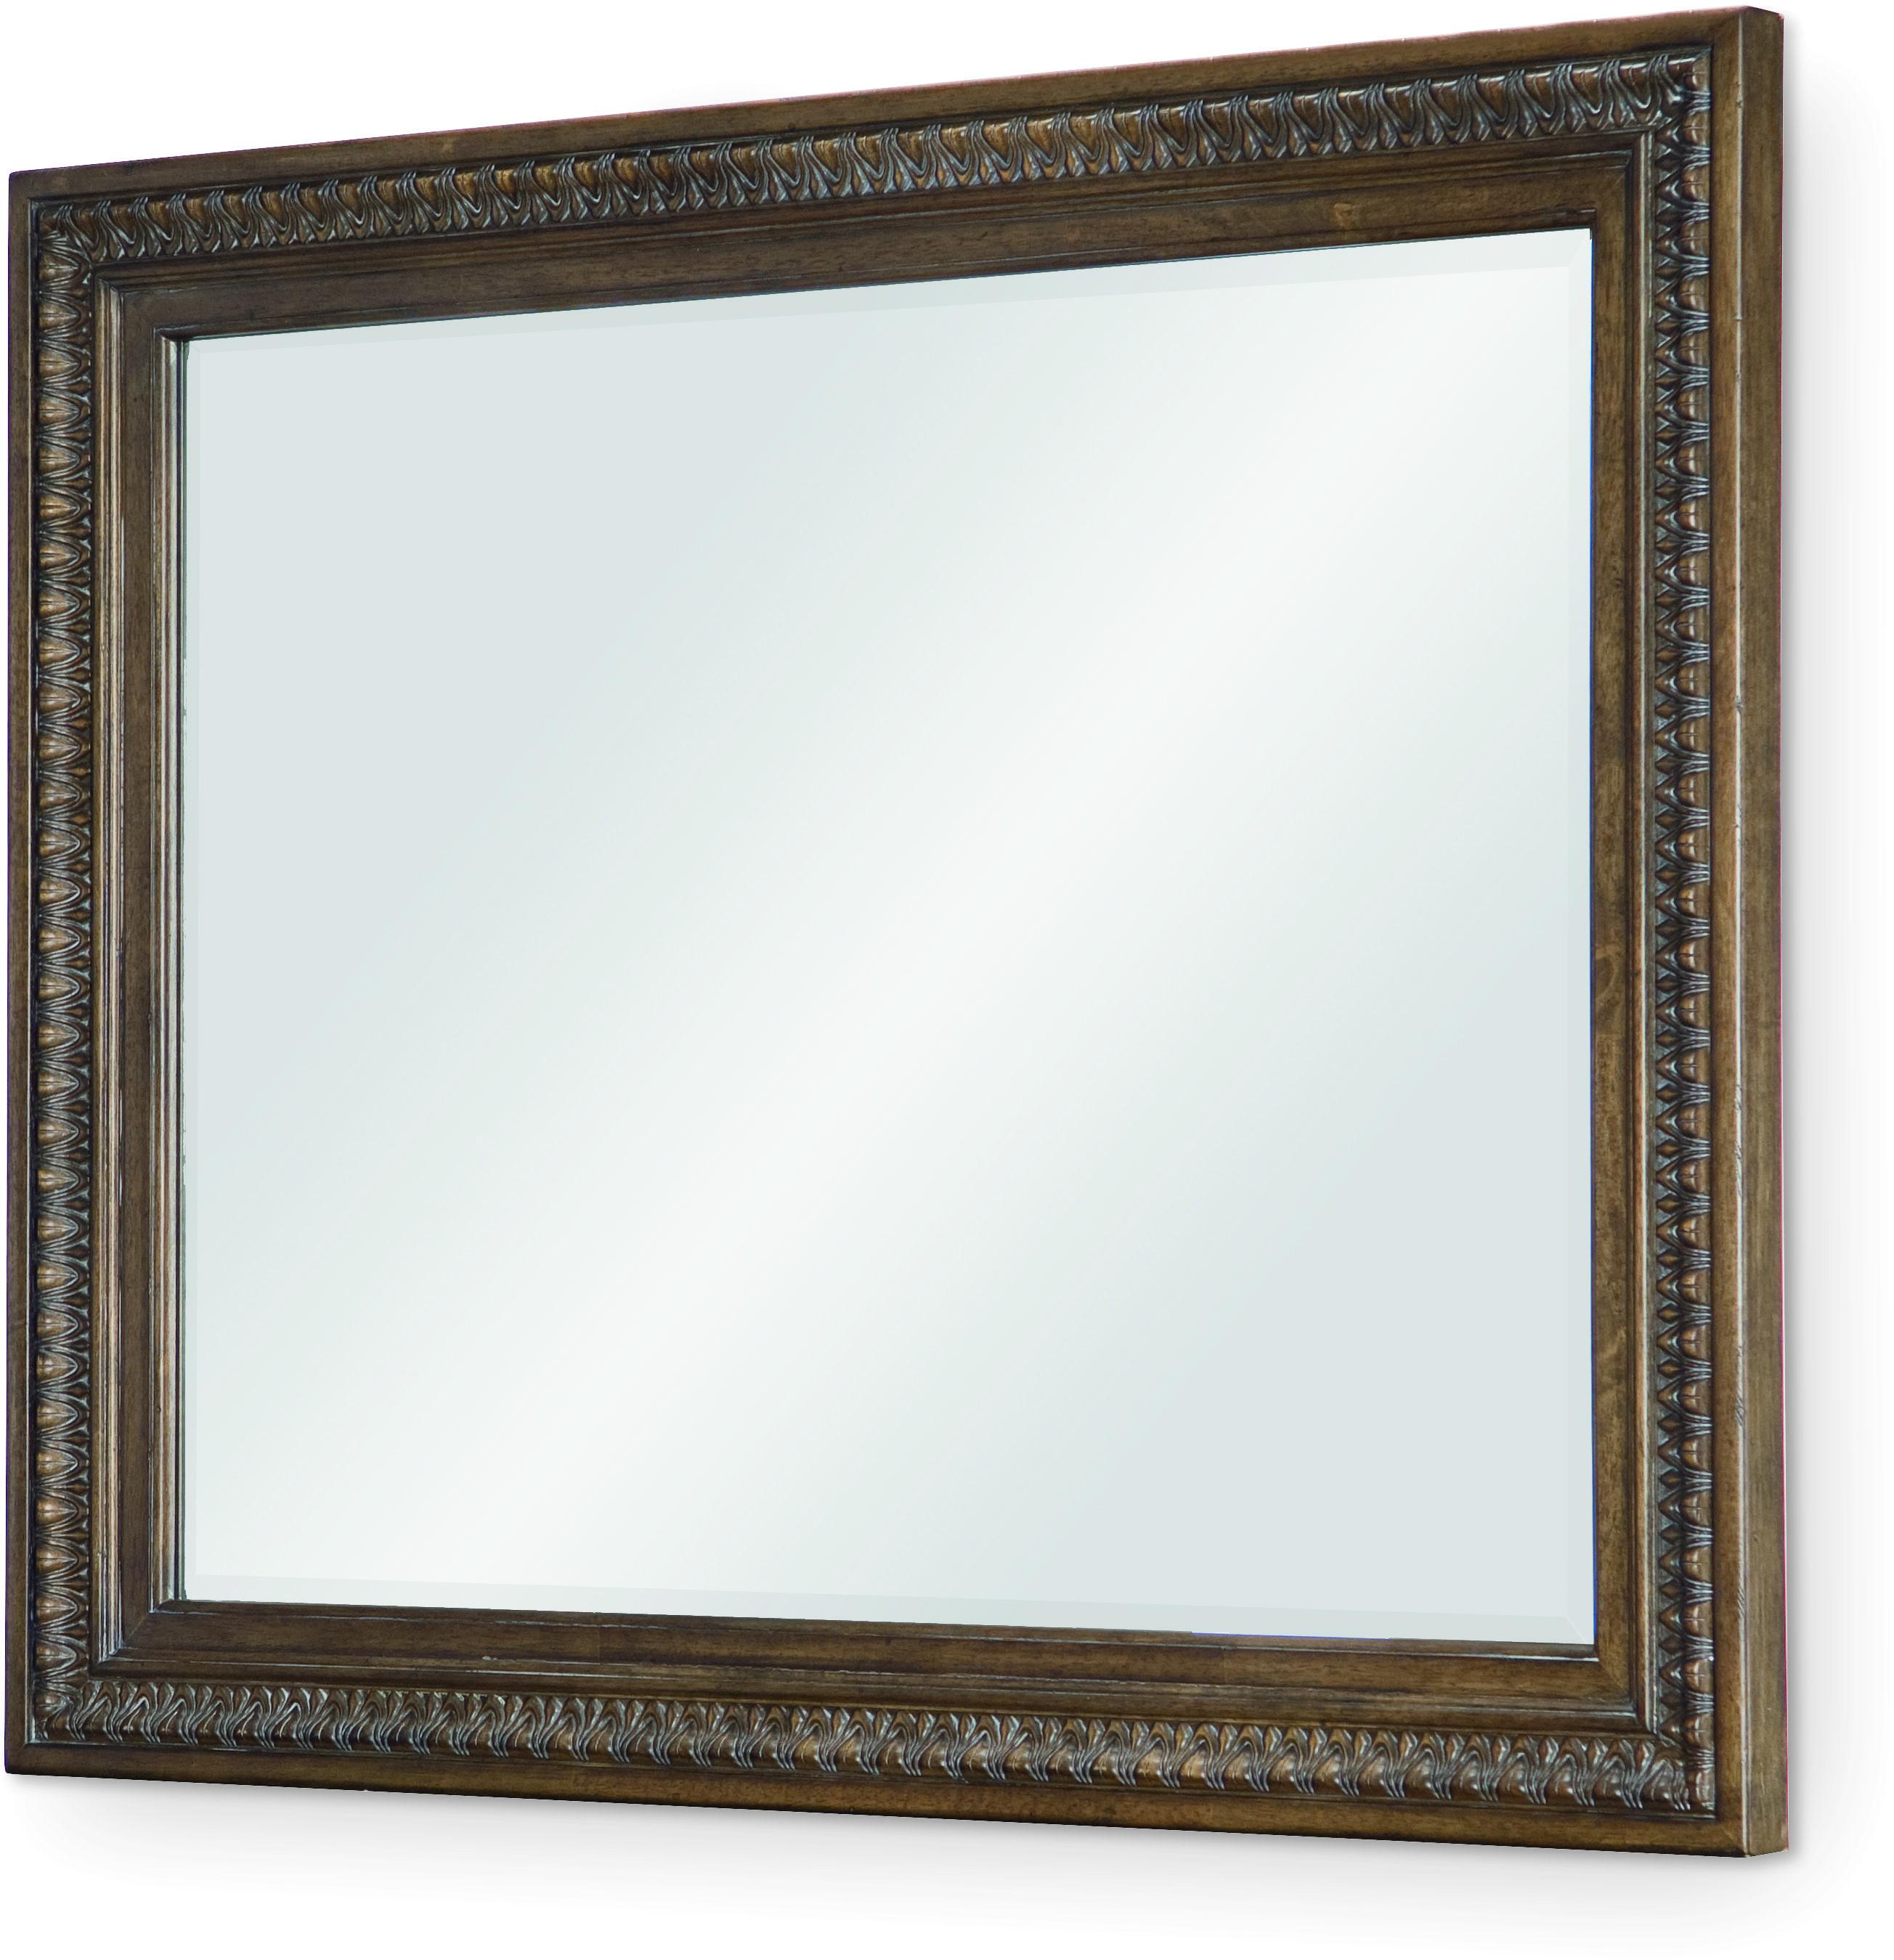 Legacy Classic Renaissance Dresser Mirror  - Item Number: 5500-0100